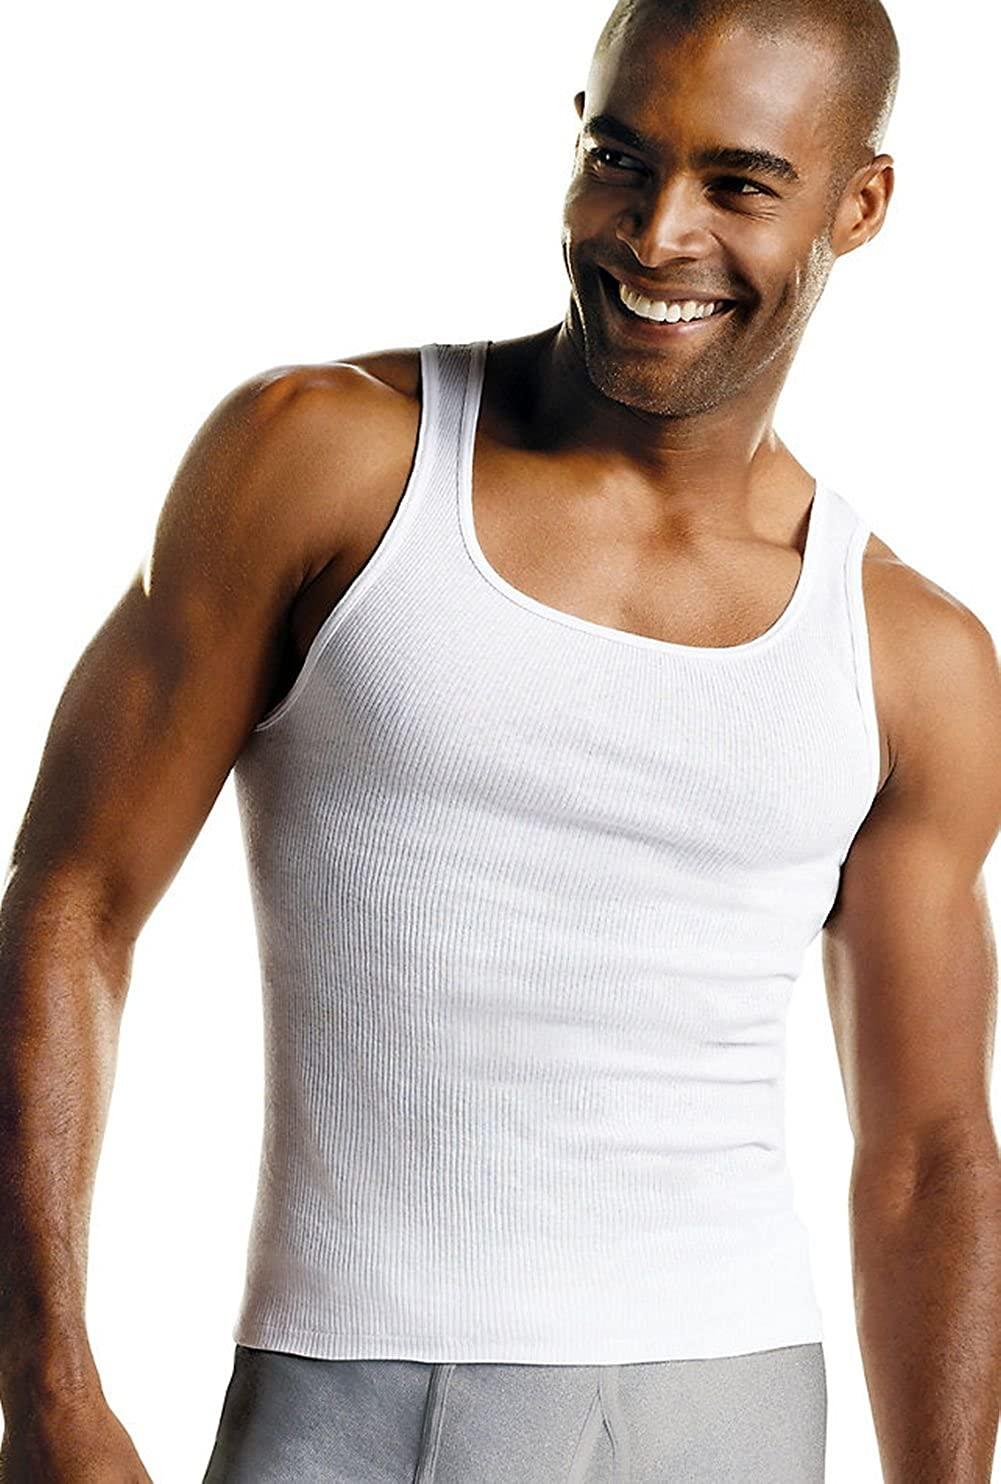 Hanes Men's TAGLESS ComfortSoft A-Shirt 7-Pack (Includes 1 Free Bonus A-Shirt)